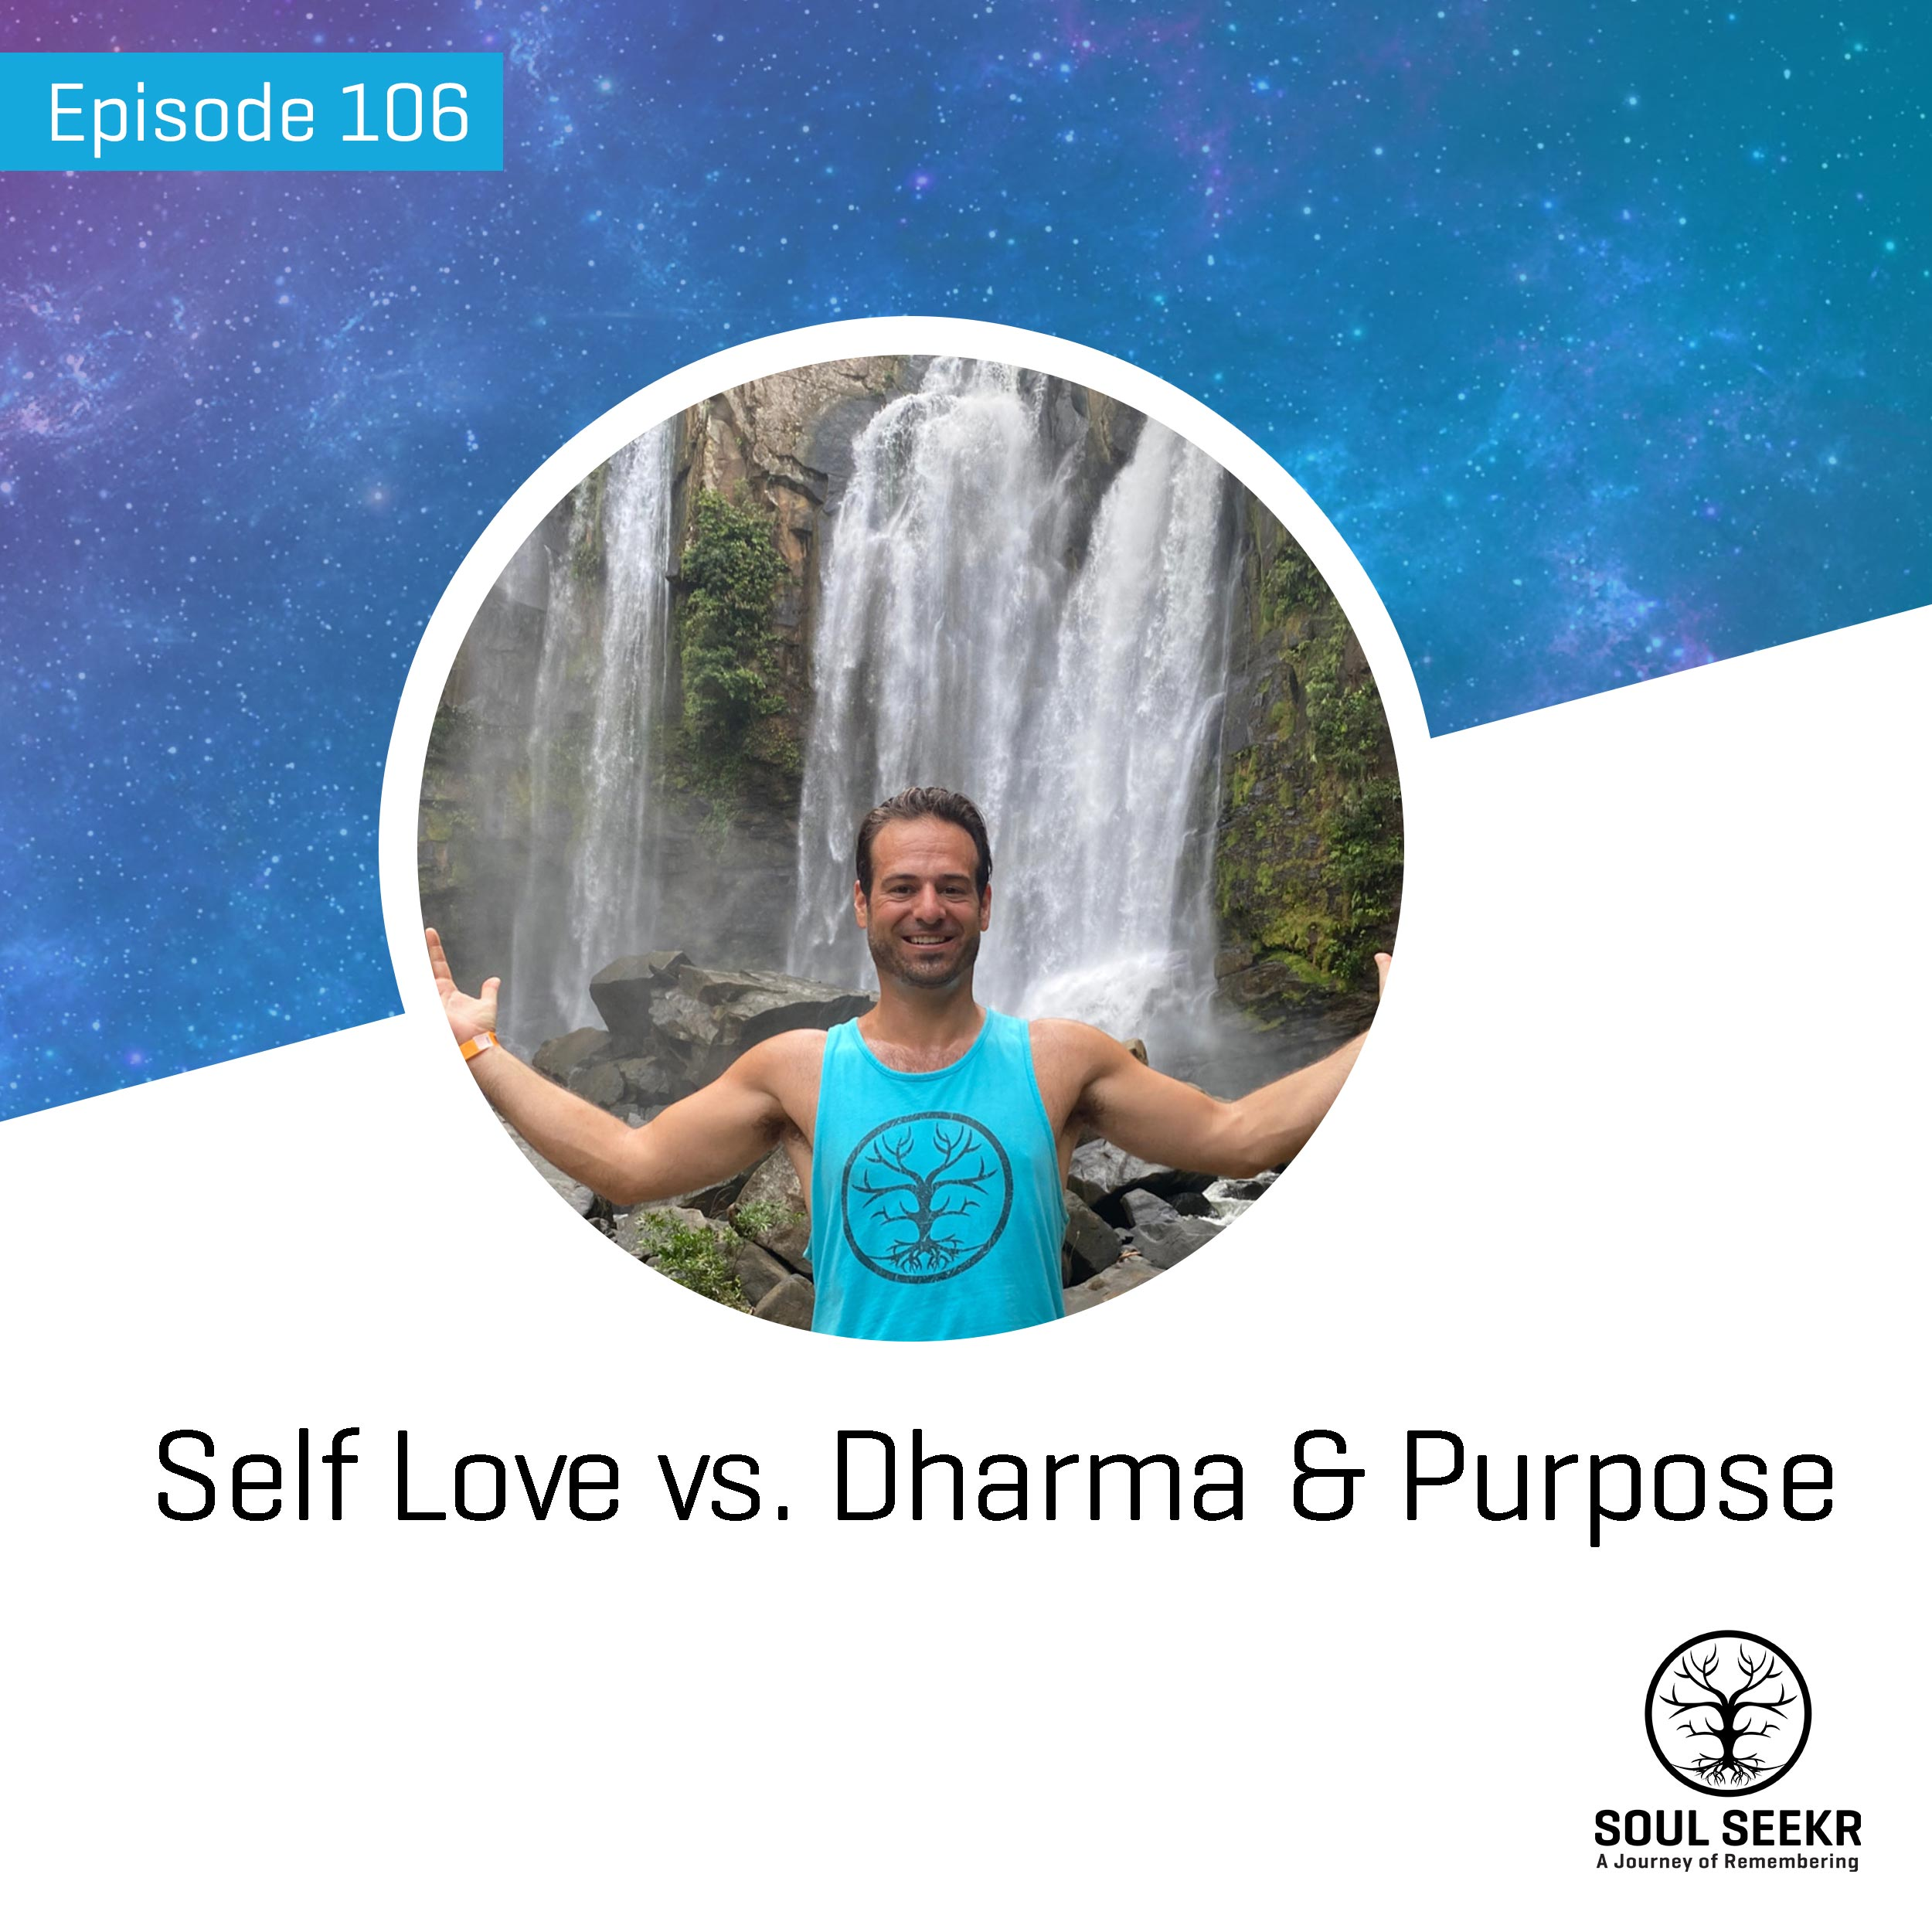 #Ep 106: Self Love vs. Dharma & Purpose